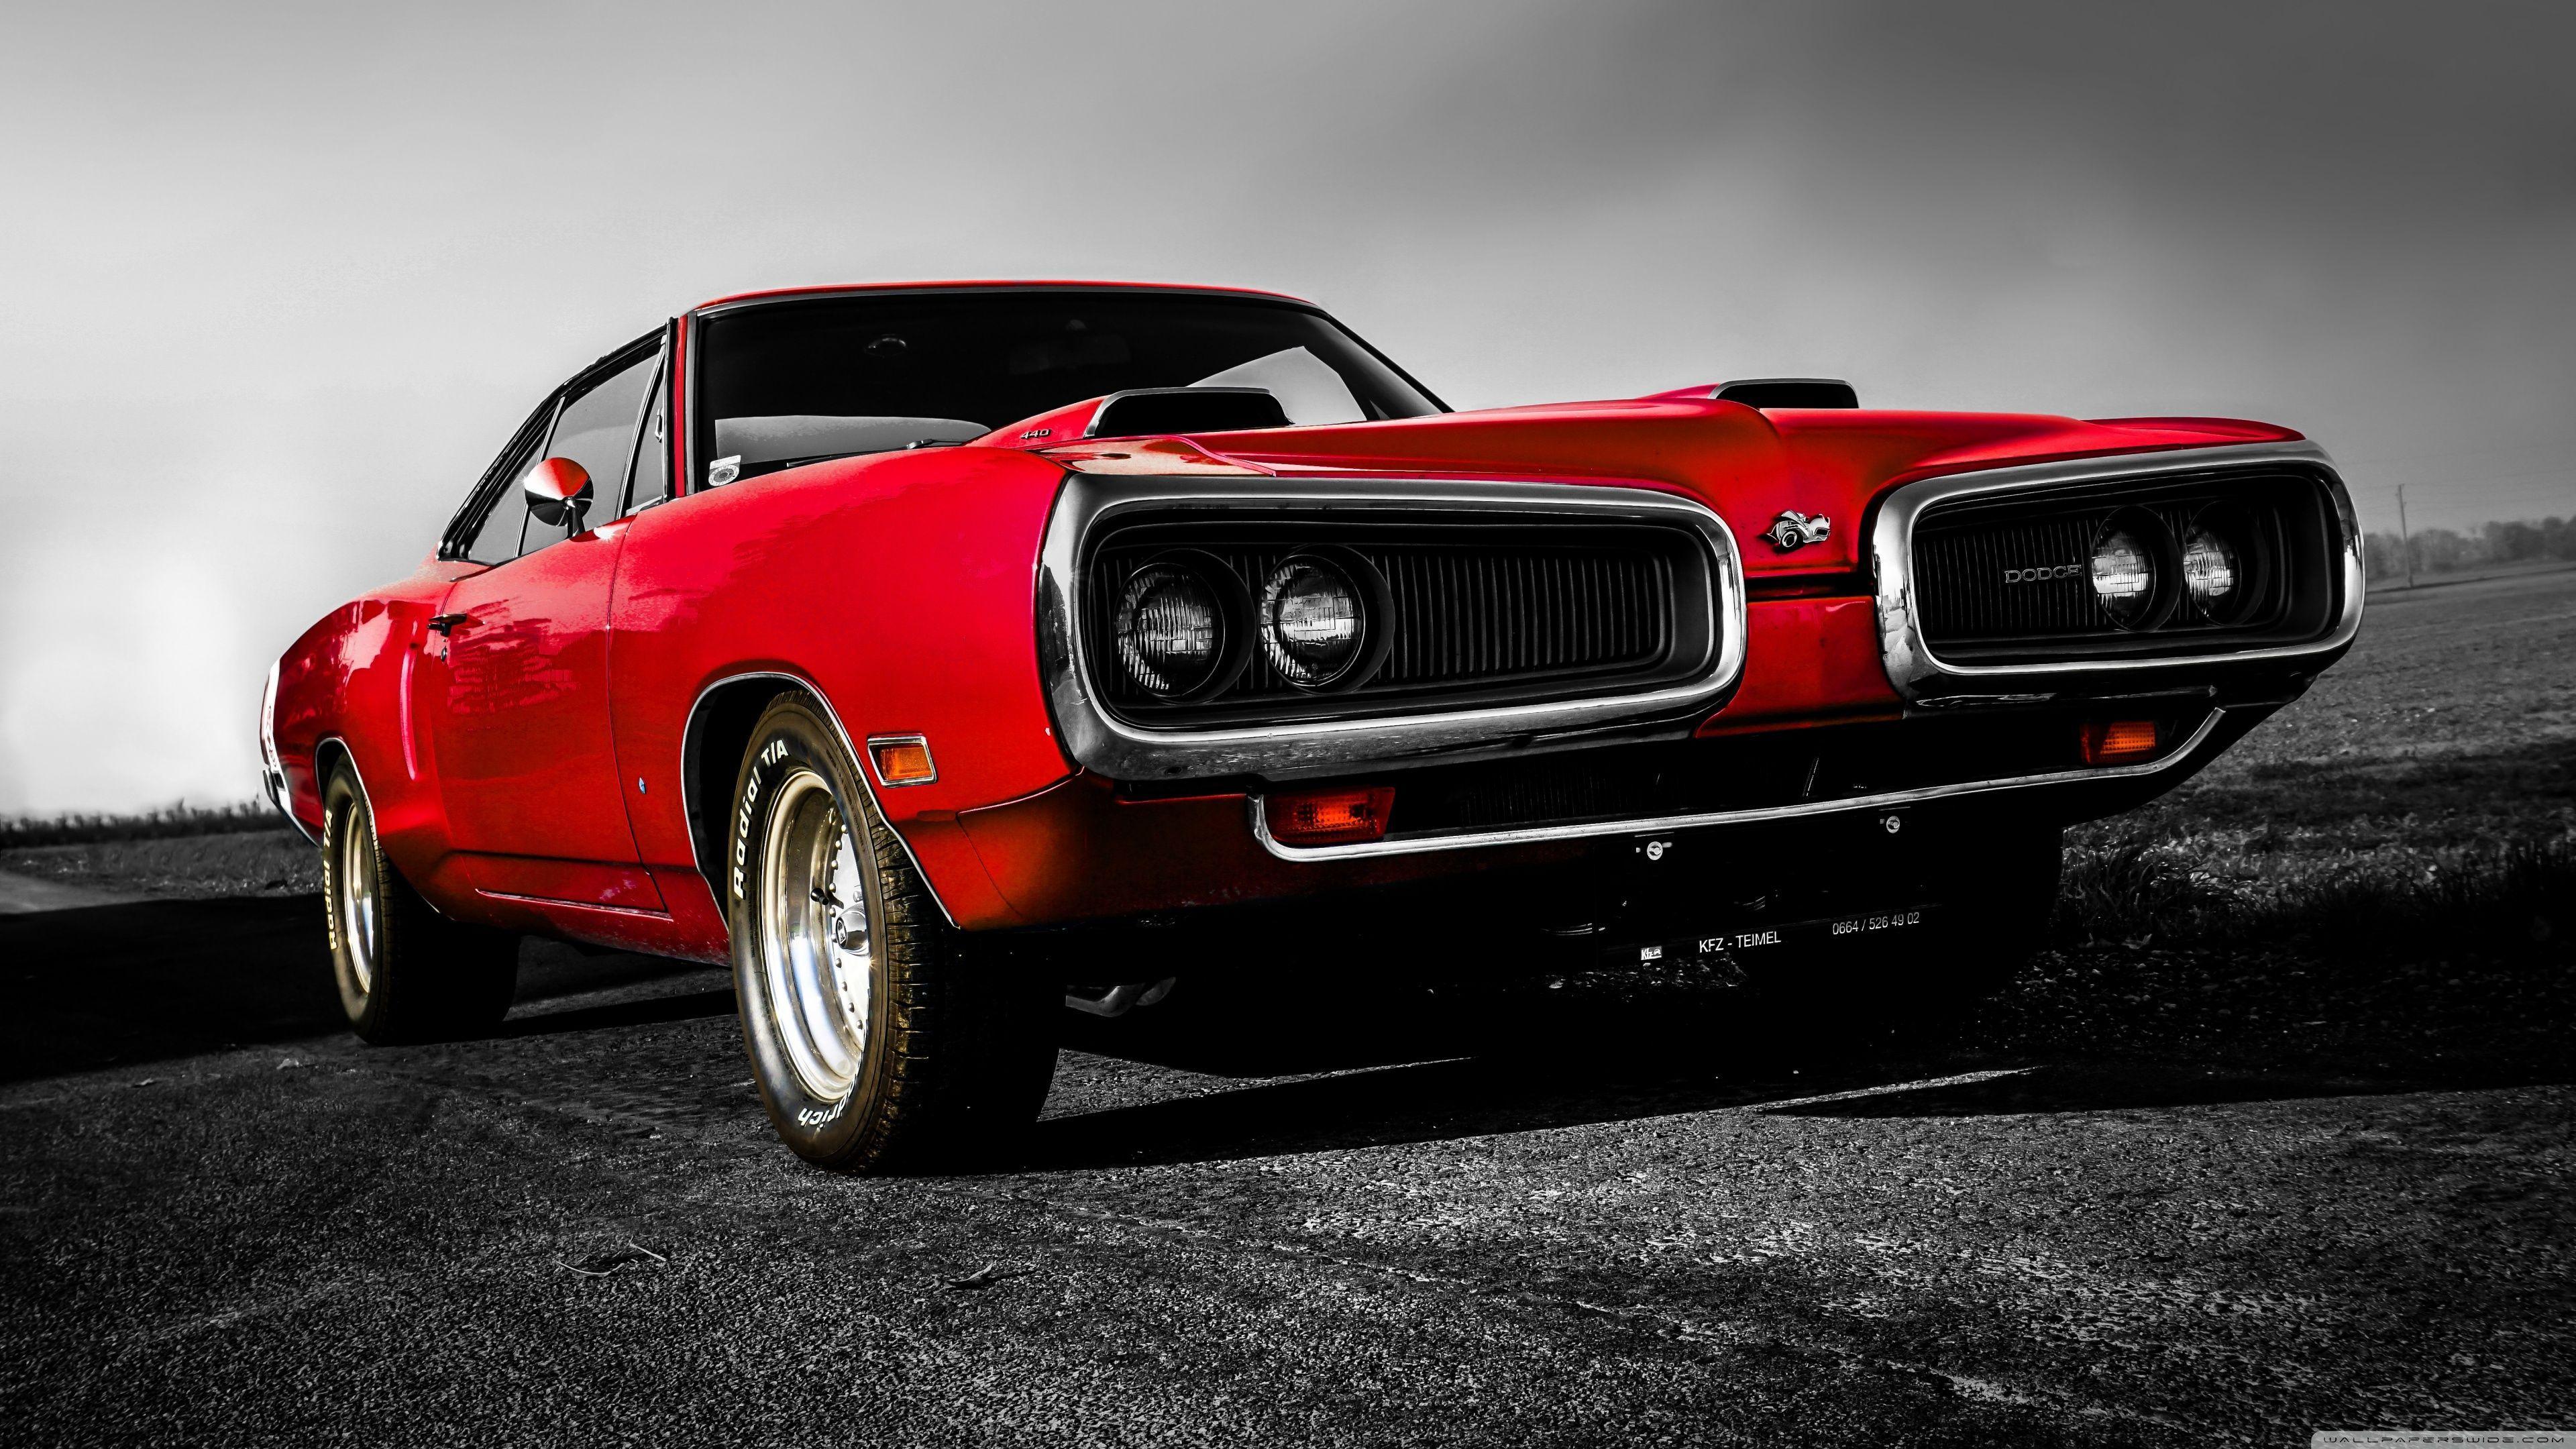 4K Classic Car Wallpapers - Top Free 4K Classic Car ...